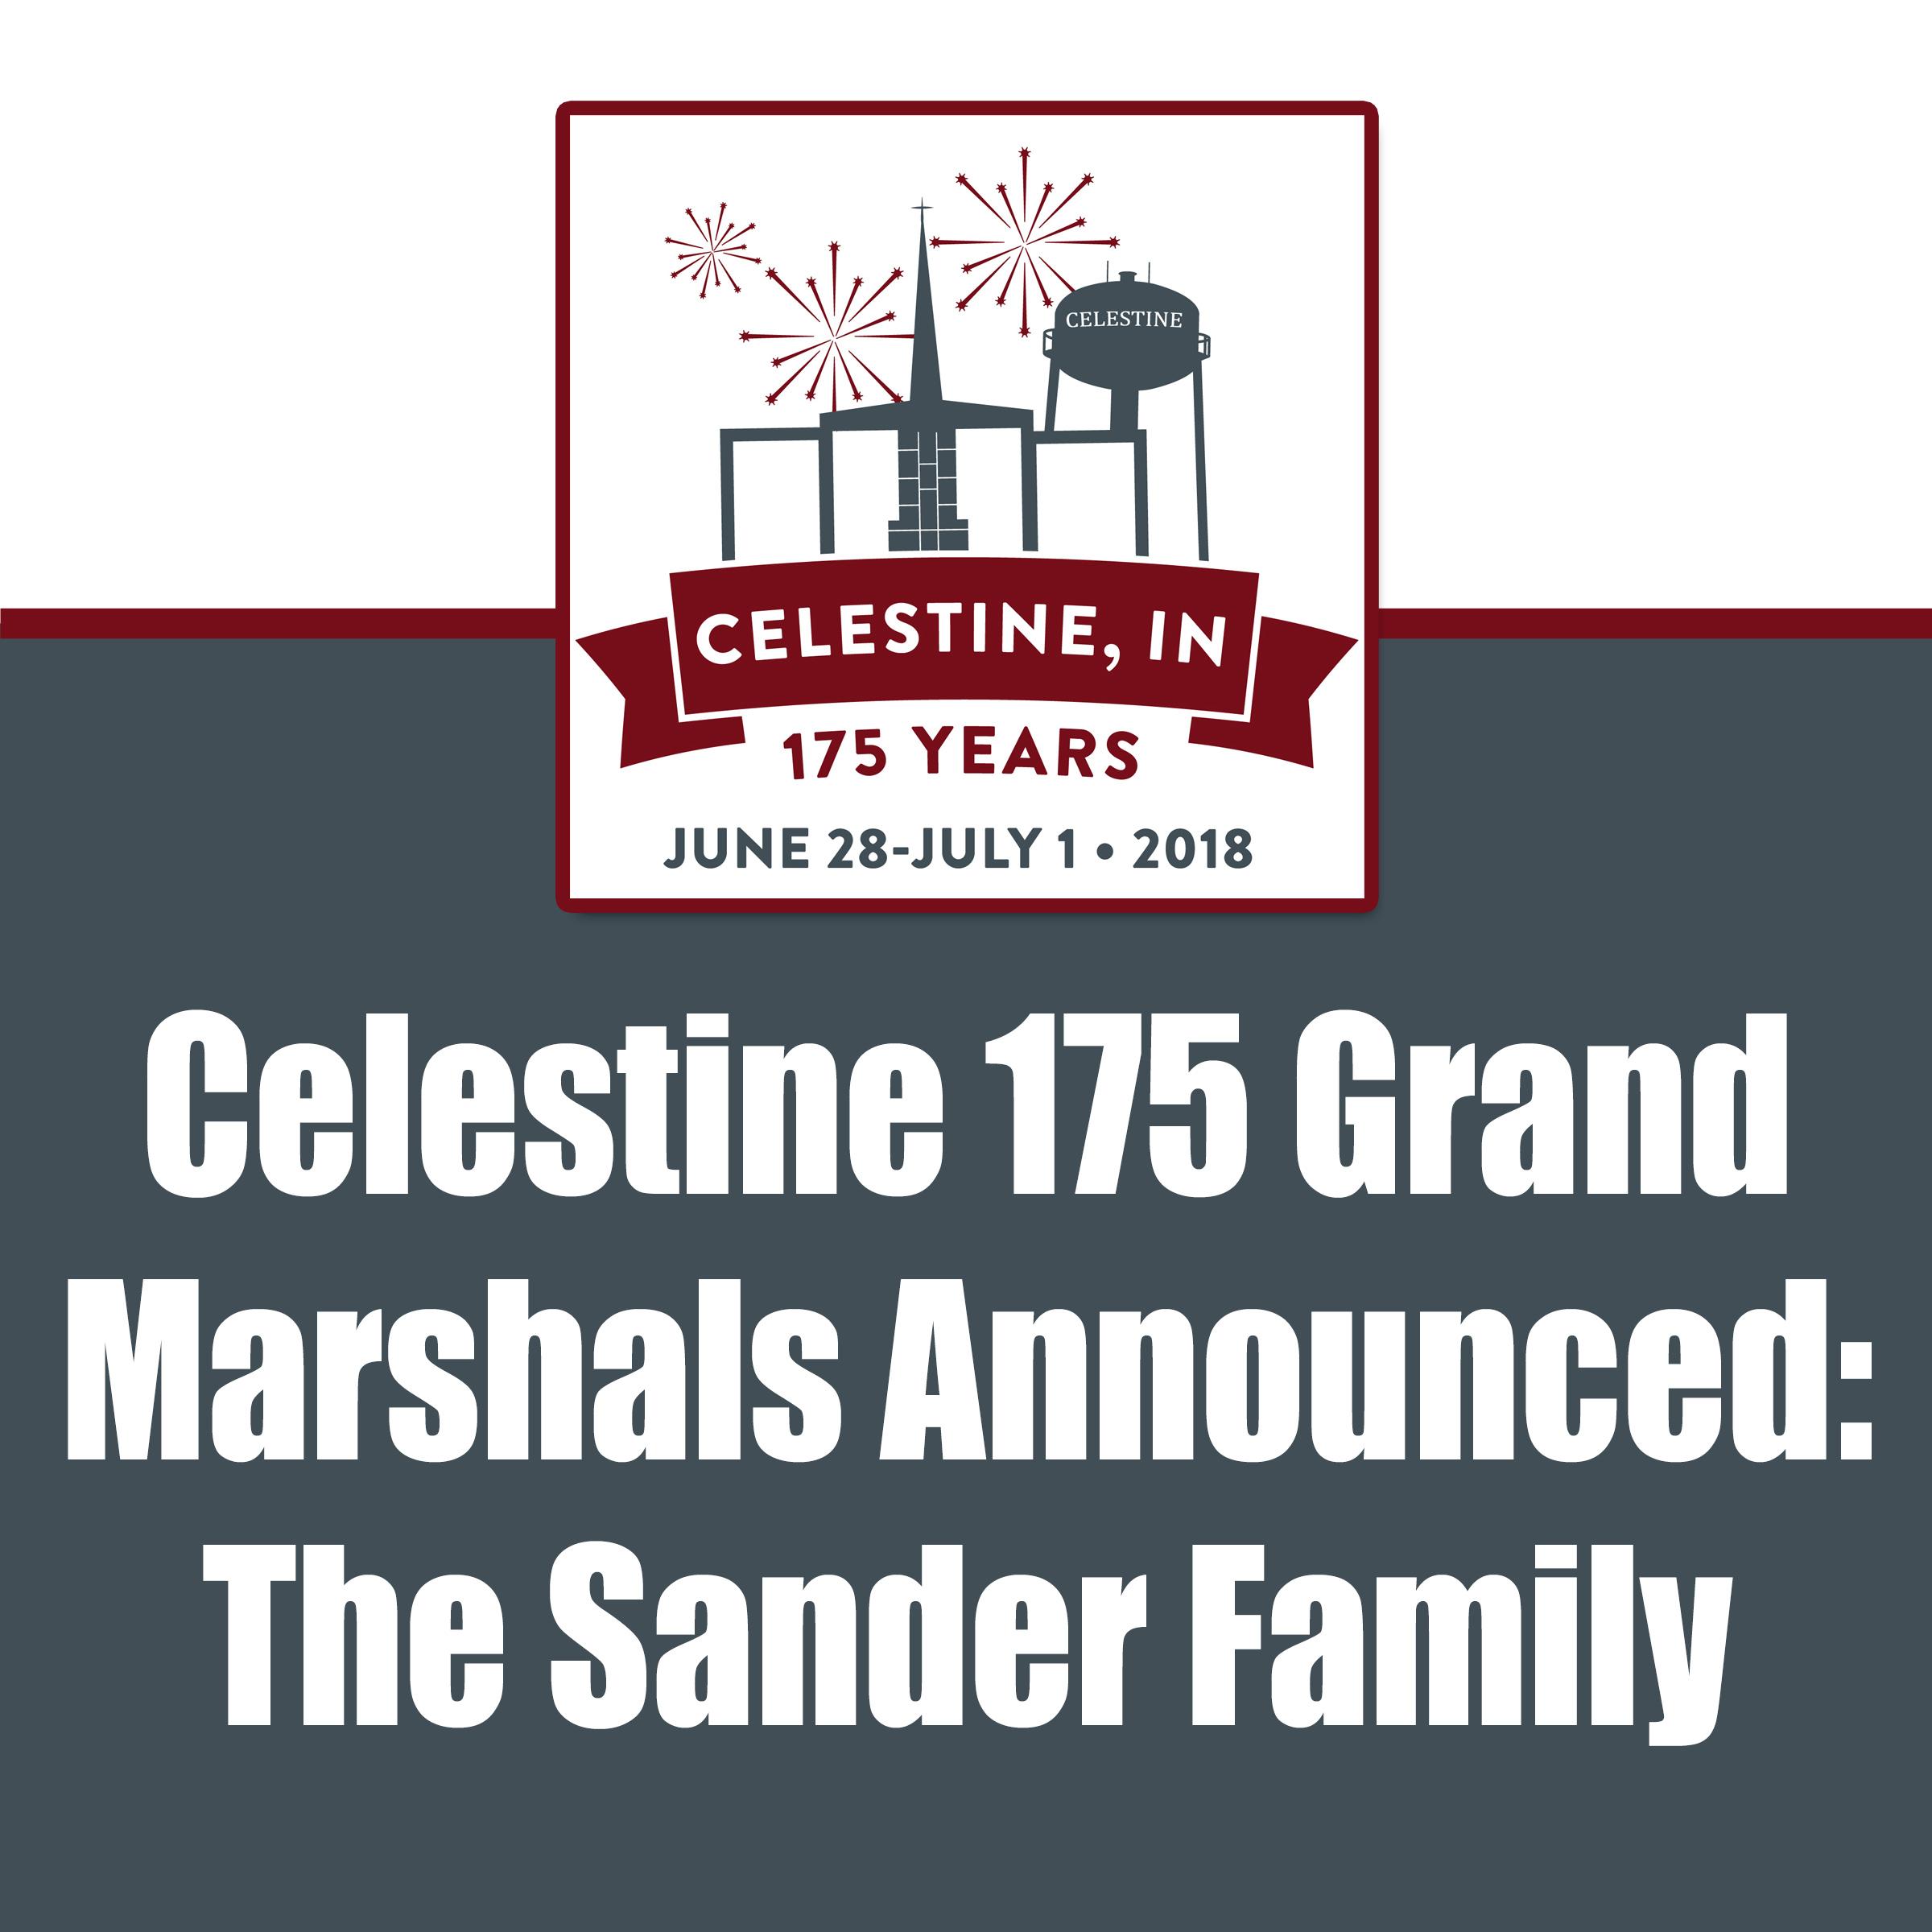 Grand-Marshal-Announcement.jpg